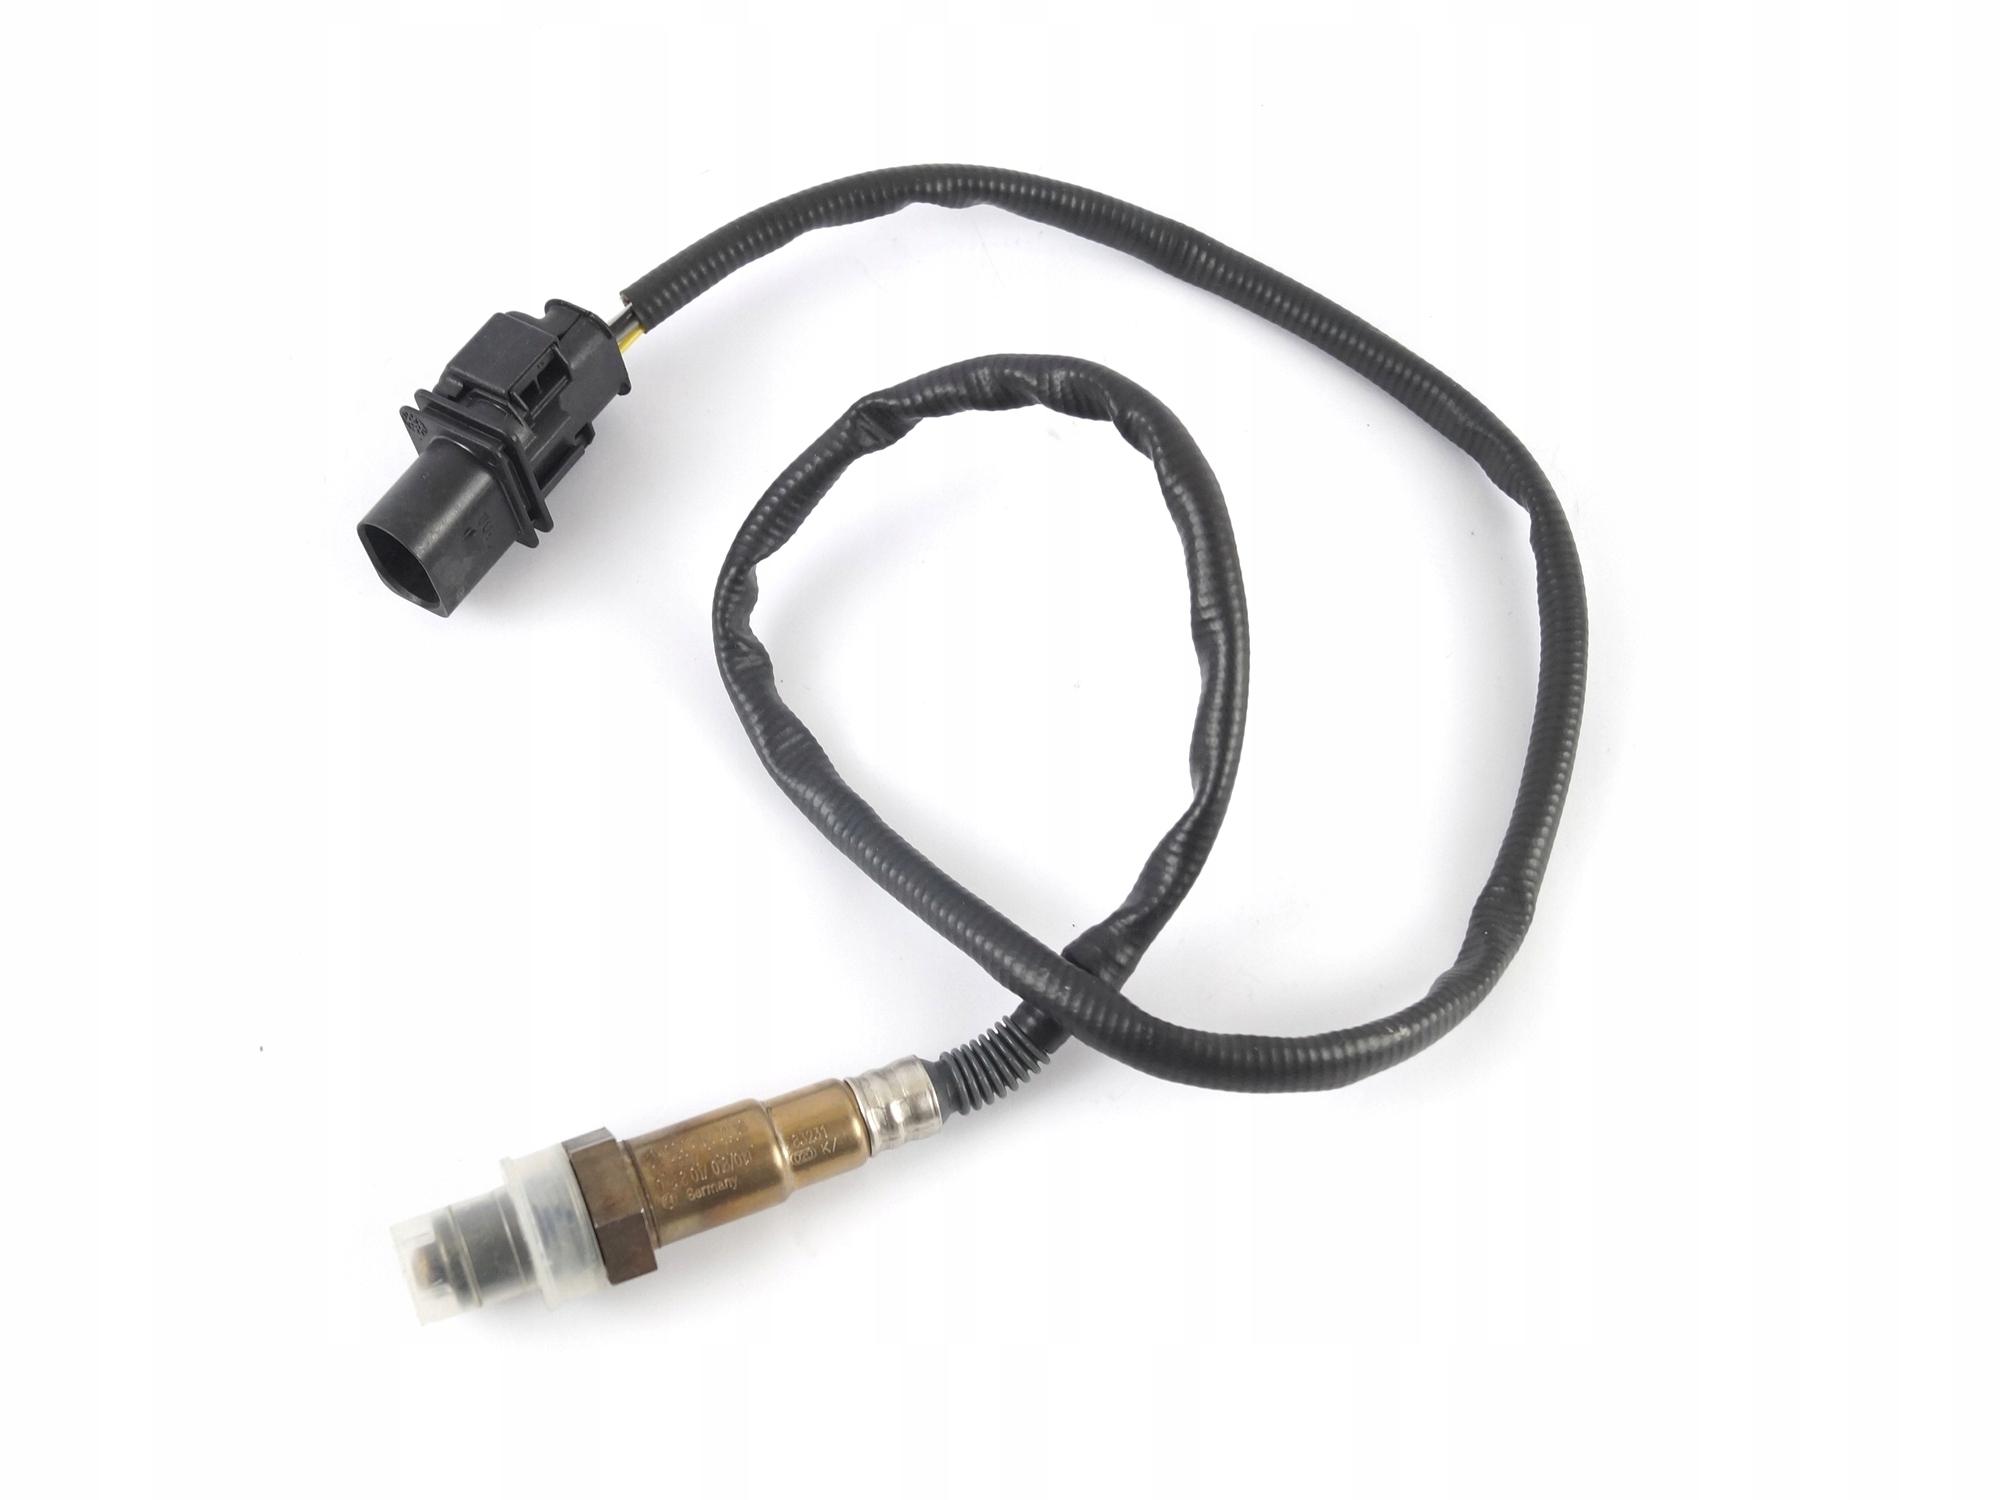 VW Polo 9N Pollen//Cabine Filtre 1.6 1.6D 09 To 10 6483455 RMP b/&b VOLKSWAGEN New